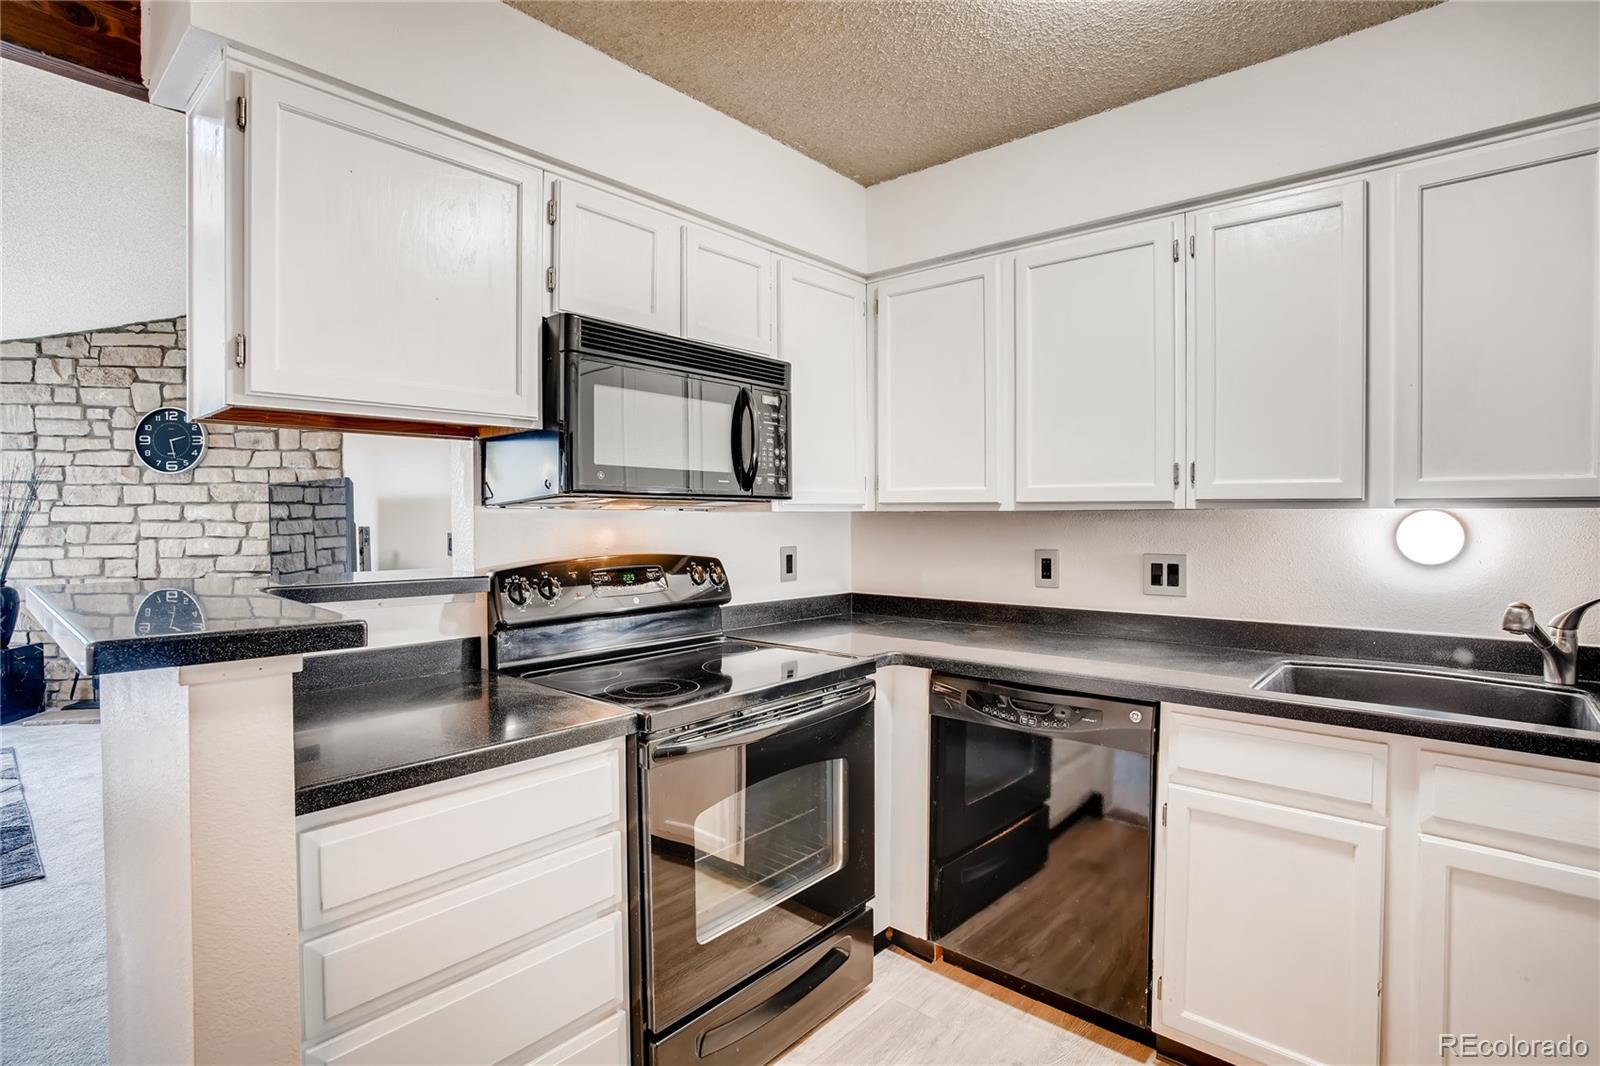 MLS# 5790313 - 9 - 333 Wright Street #306, Lakewood, CO 80228